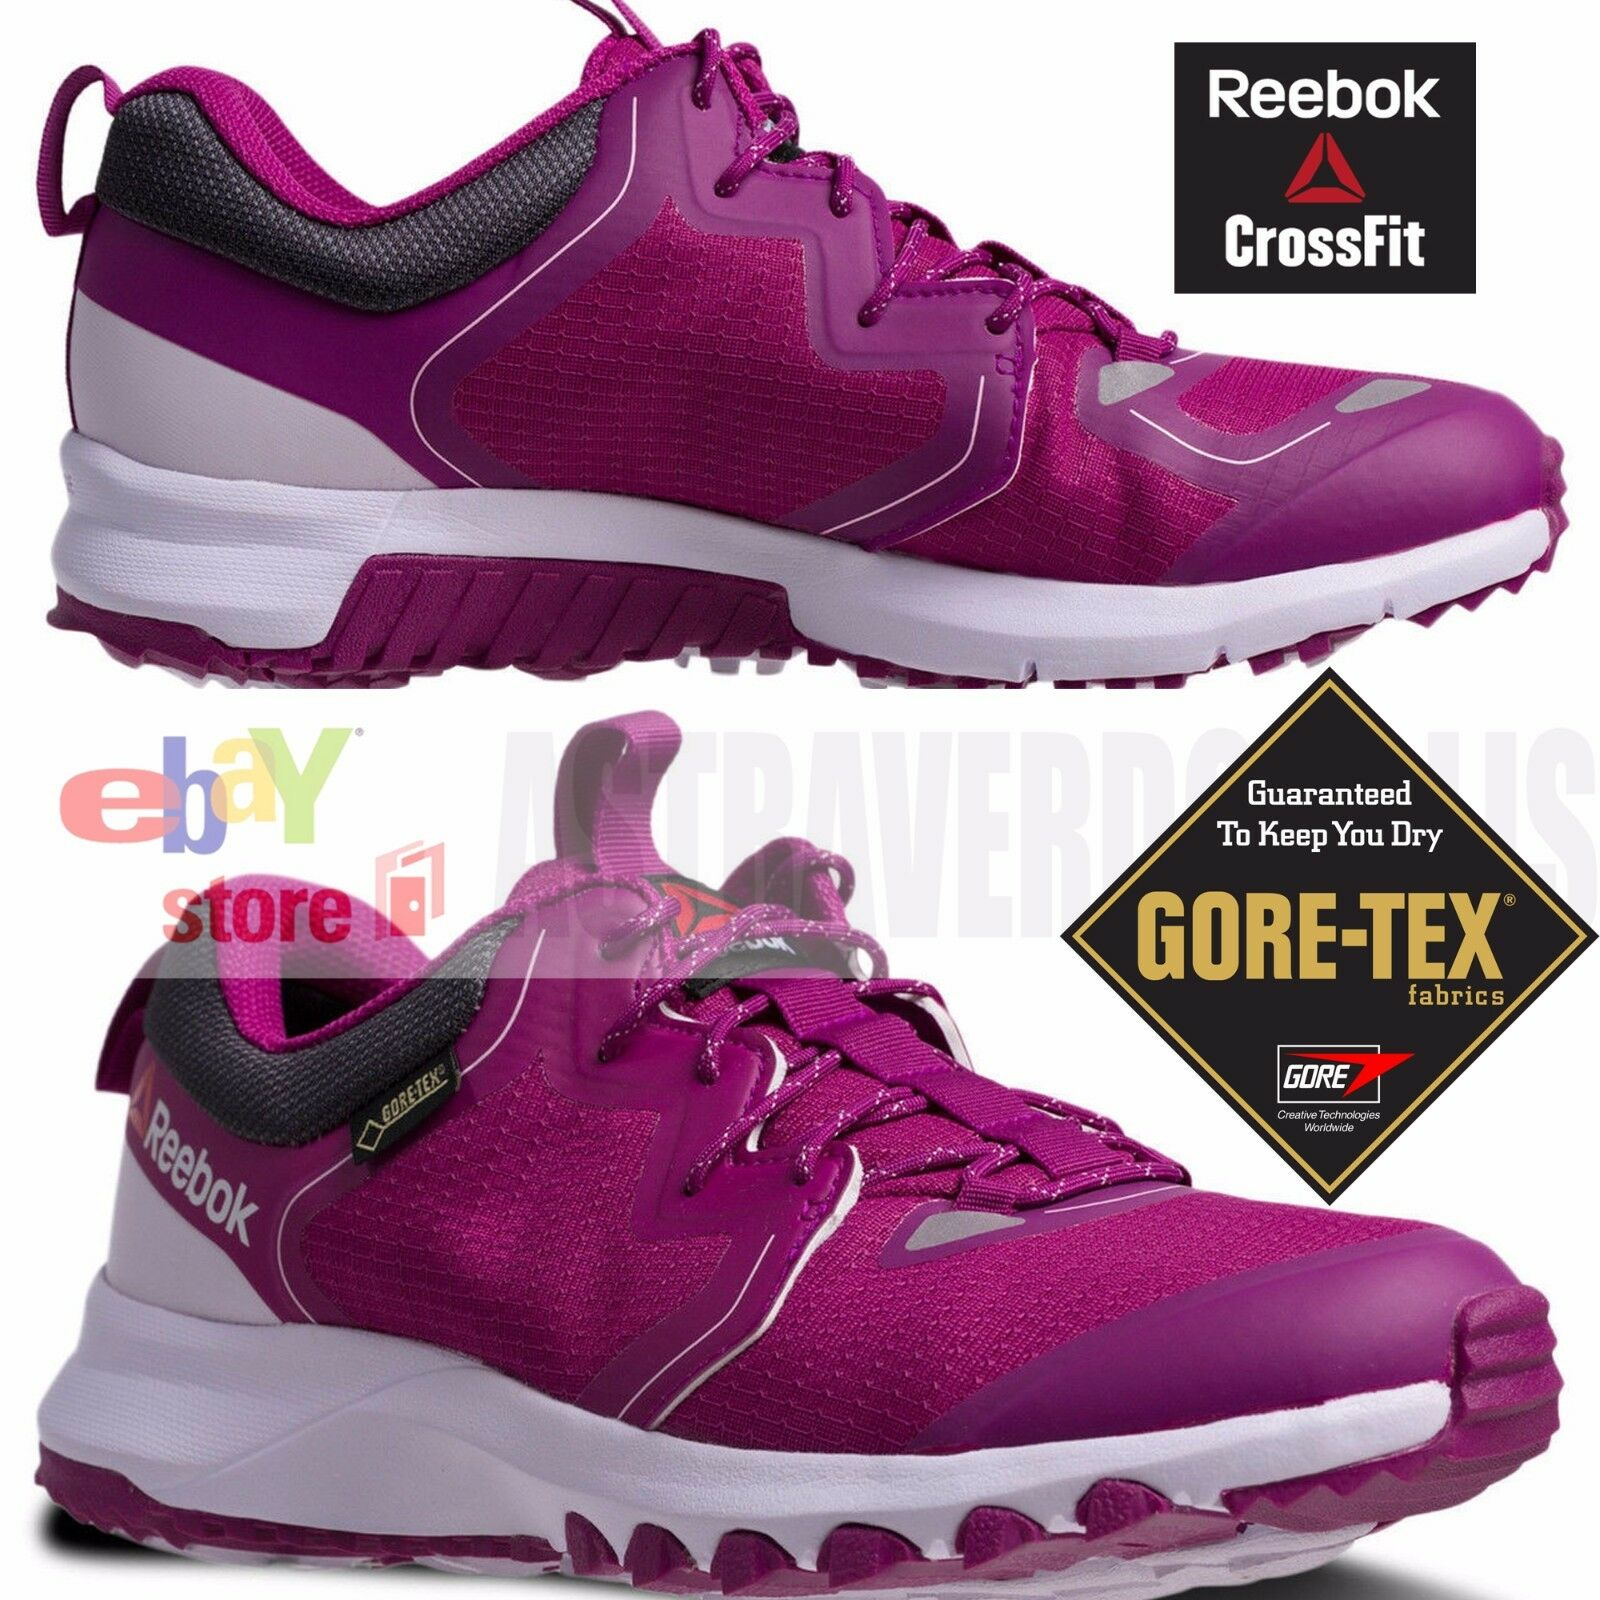 REEBOK femmes Chaussures  GORE TEX EDGE DMX CROSSFIT NANO SIZE US 6.5 8 TRAINING TRAIL